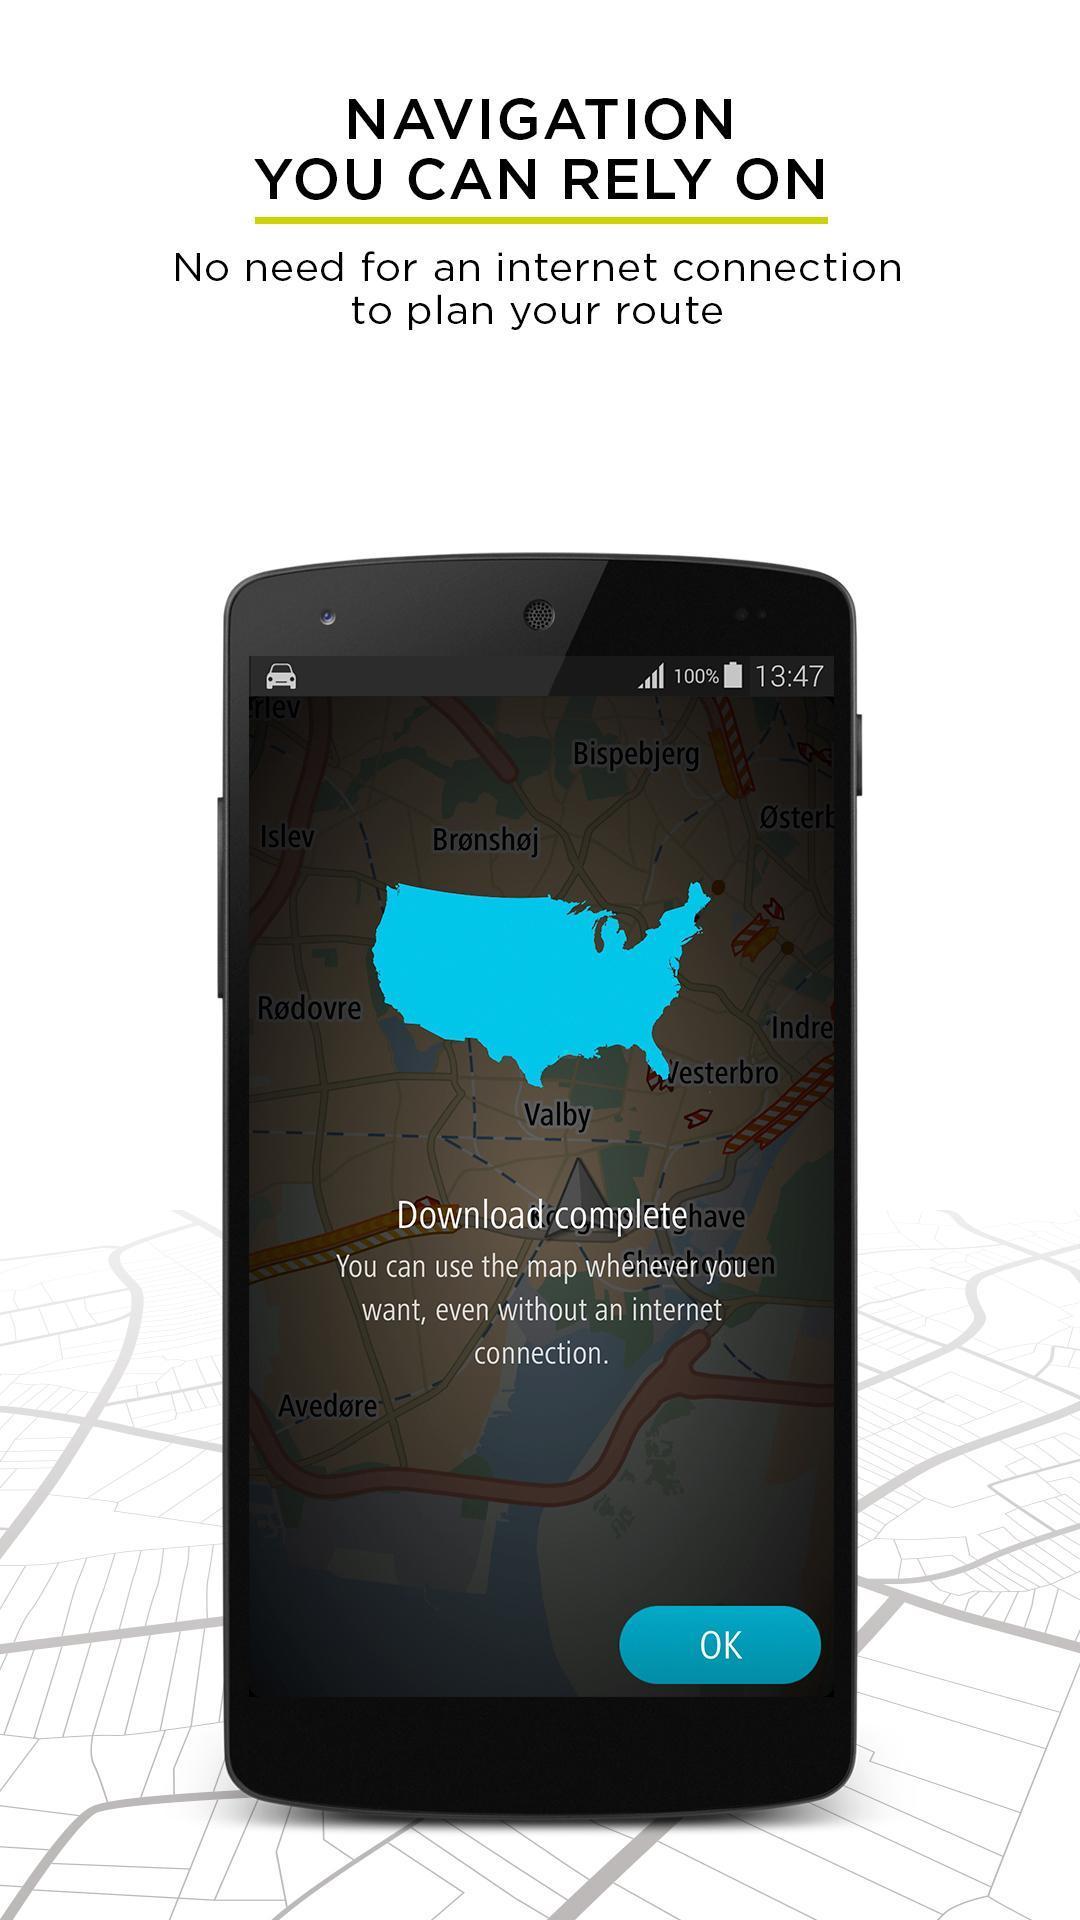 TomTom GPS Navigation - Live Traffic Alerts & Maps for Android - APK on